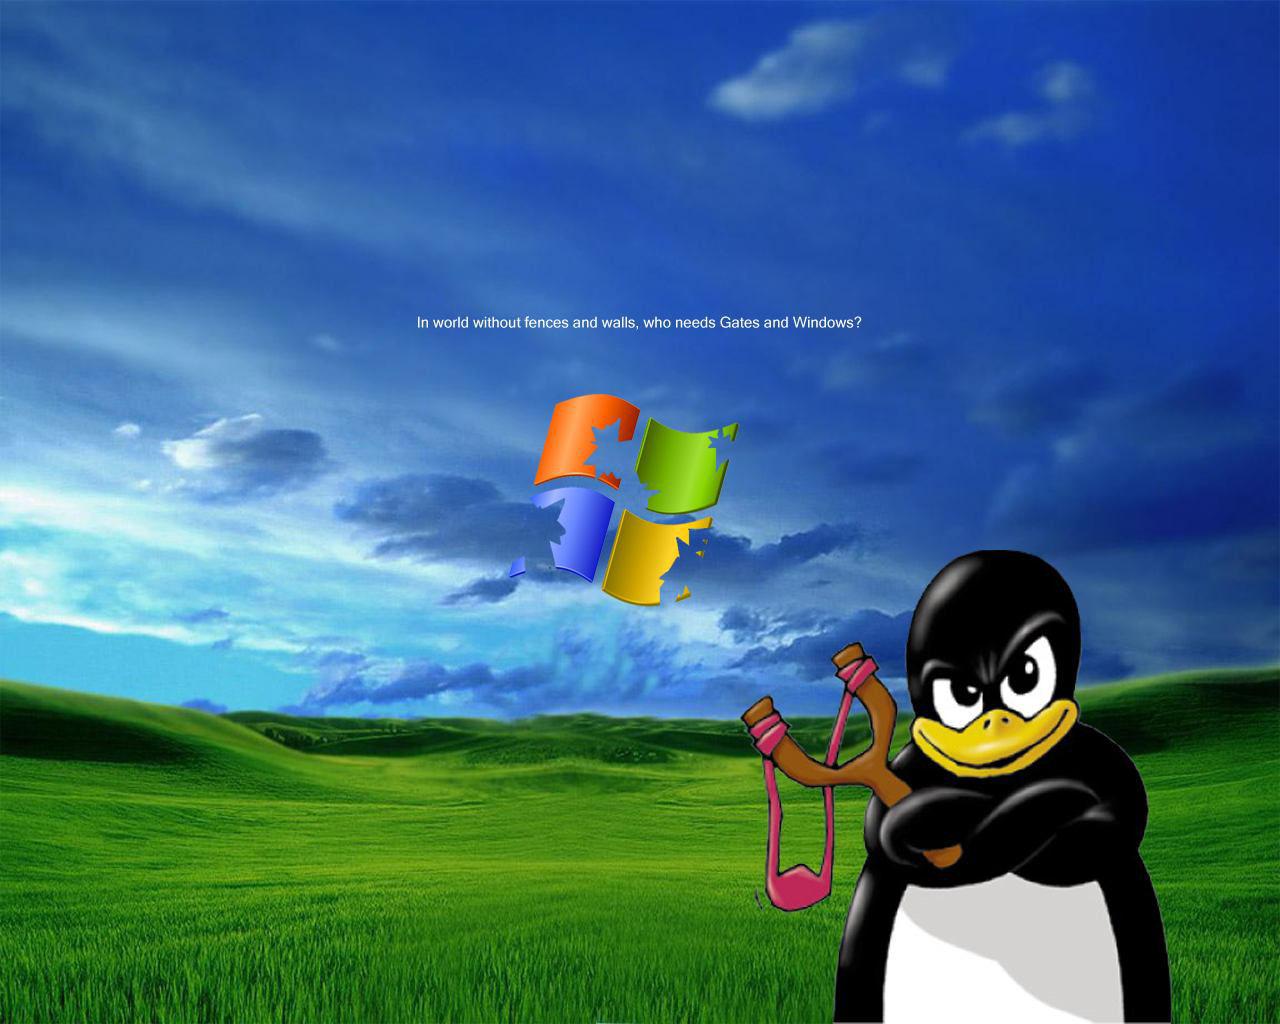 http://3.bp.blogspot.com/-ehvf9CC4KT0/TZyqpJFezII/AAAAAAAAGKc/UlqWJSrnj9U/s1600/desktop%252Bwallpaper.jpg